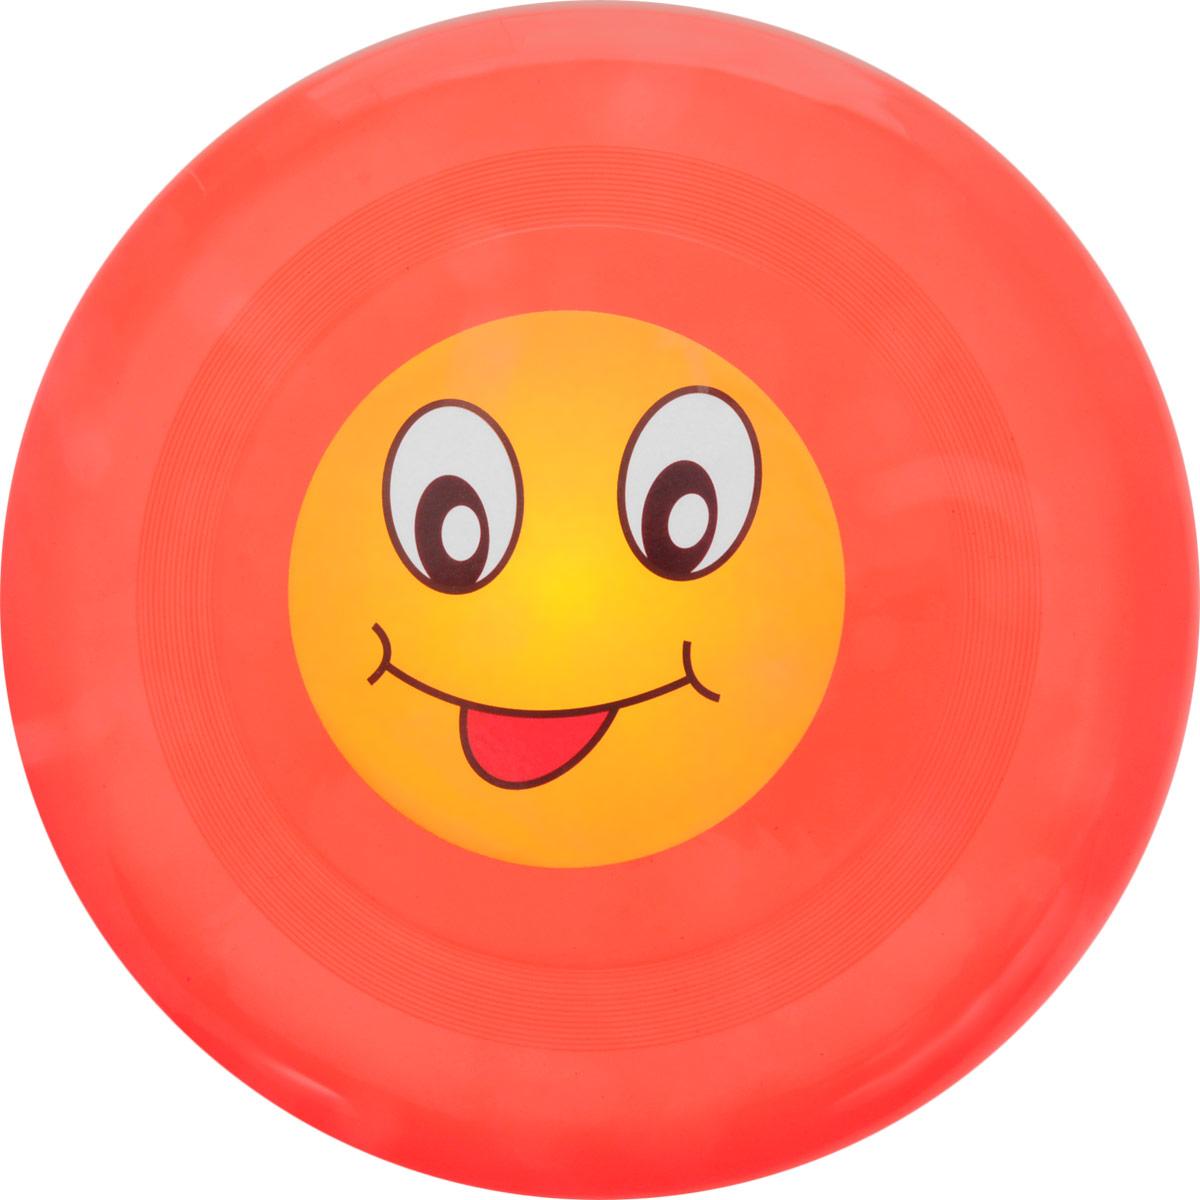 Veld-Co Летающая тарелка Смайл цвет красный диаметр 24 см